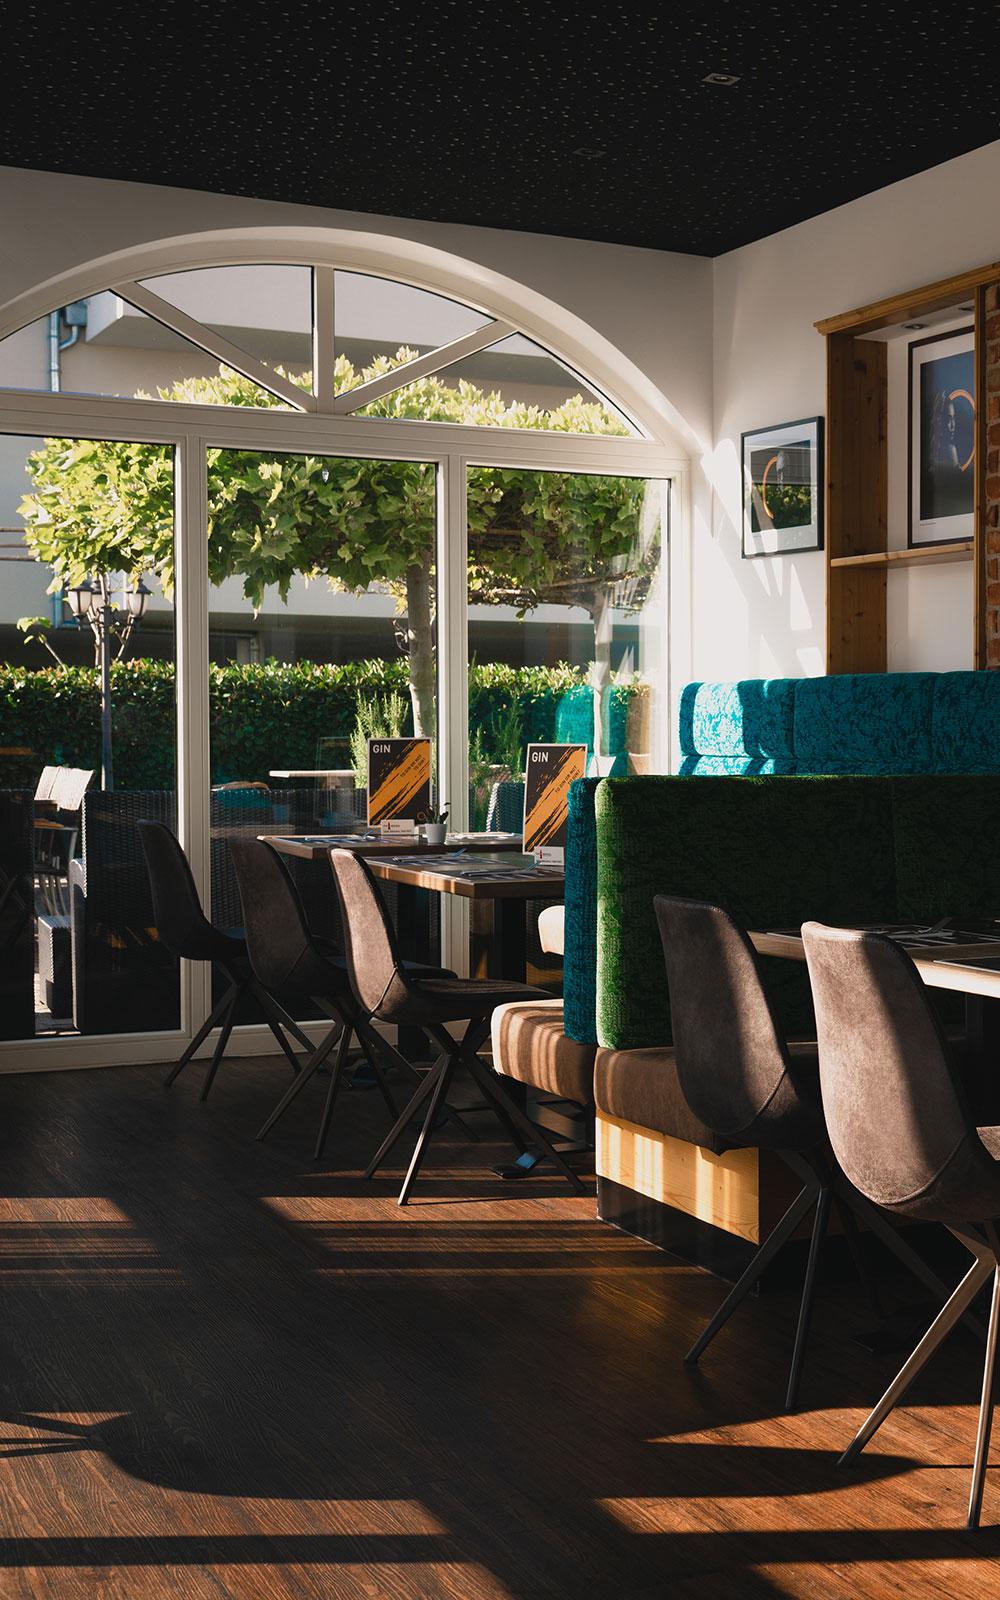 Restaurant & Bar im schönen Wittlich an der Mosel - Artisst